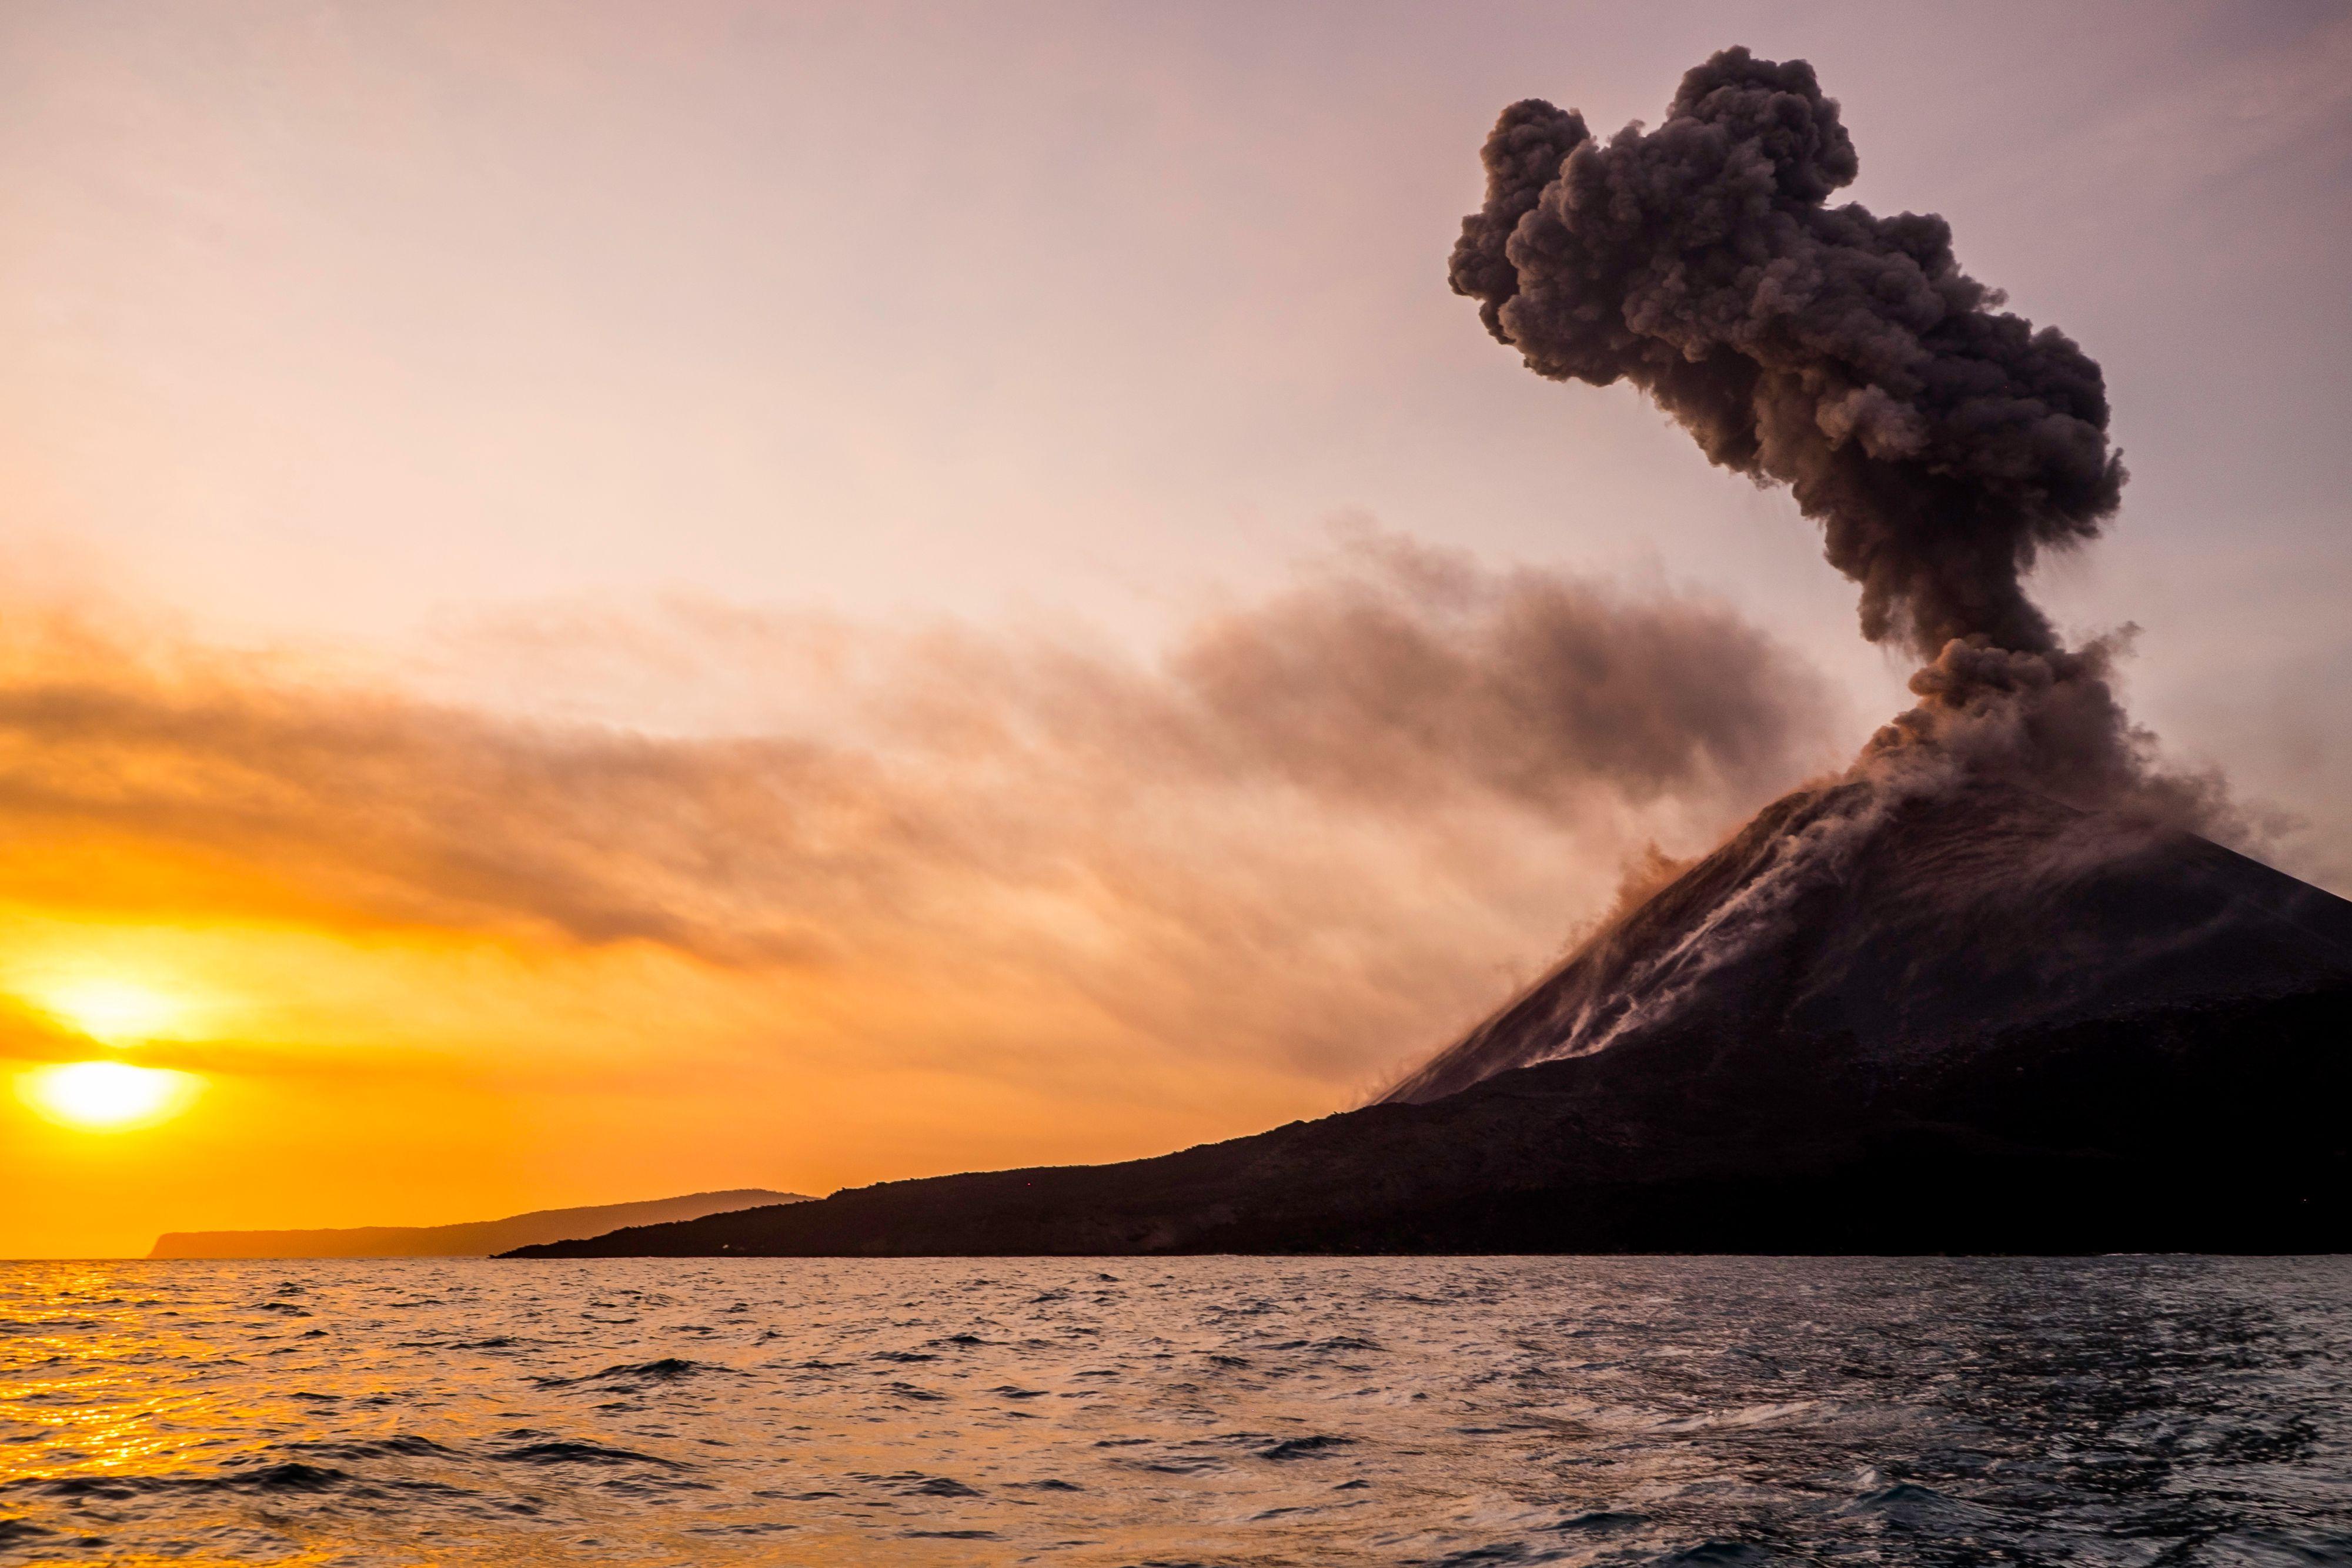 Fatal Eruption Triggered a 'Volcanic Freeze'